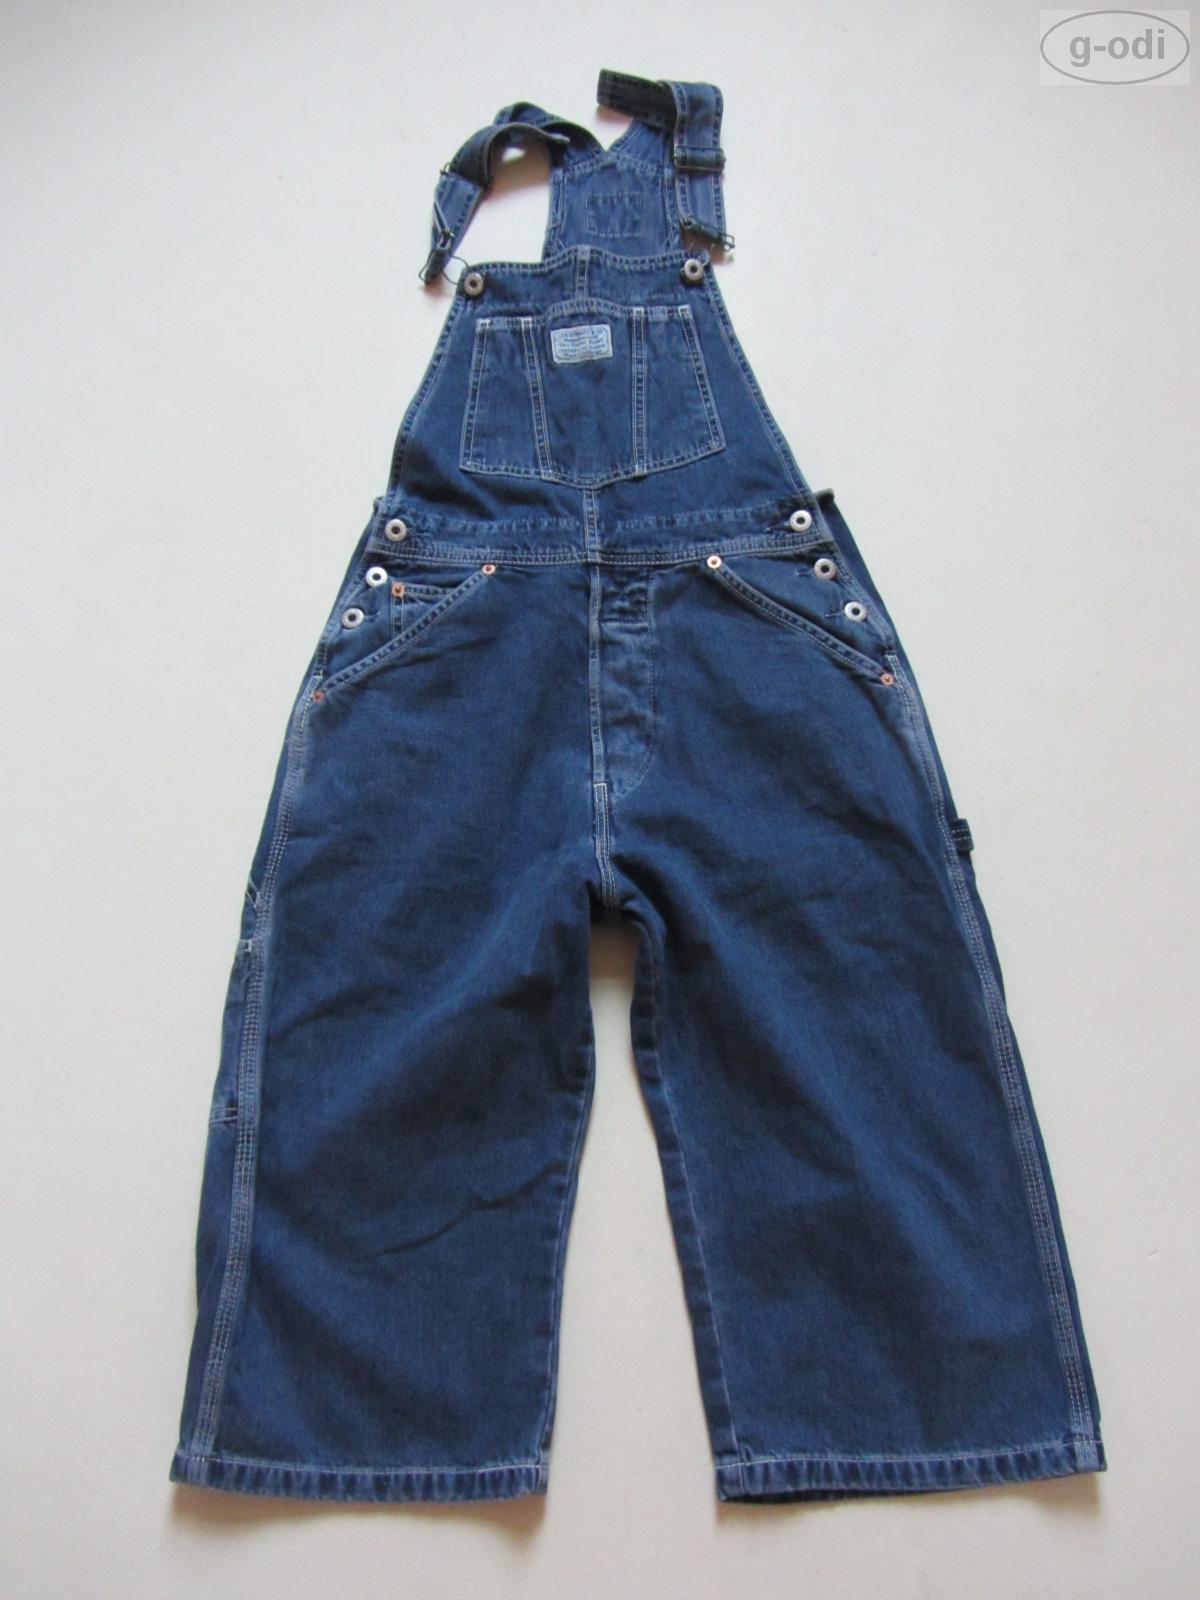 levi 39 s latzhose latz jeans hose gr s w 27 28. Black Bedroom Furniture Sets. Home Design Ideas